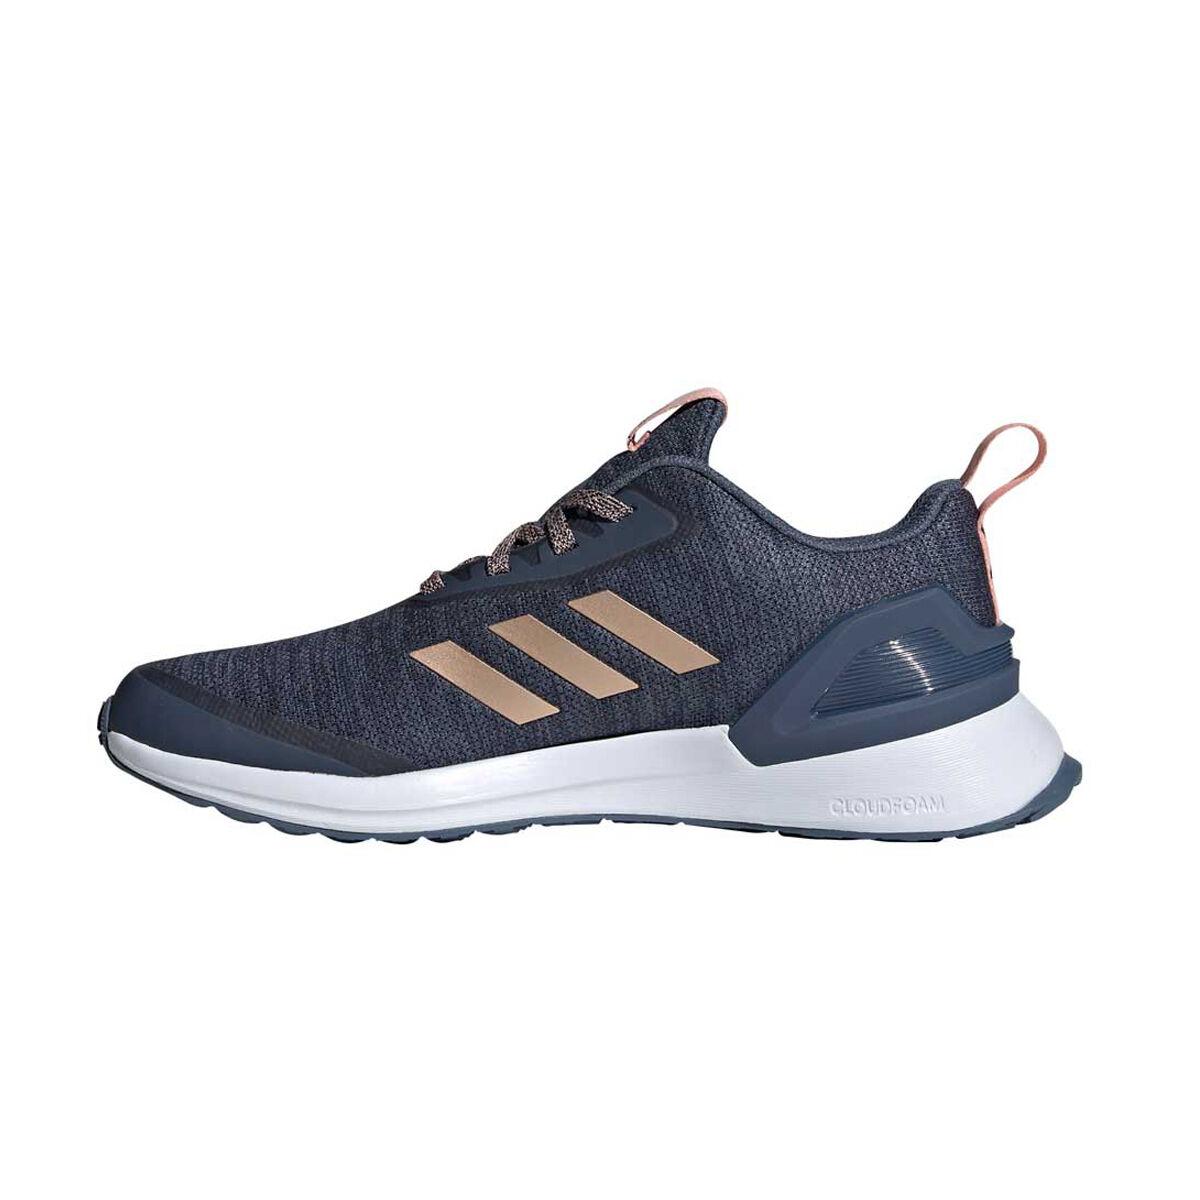 adidas RapidaRun X Kids Running Shoes Blue Pink US 6